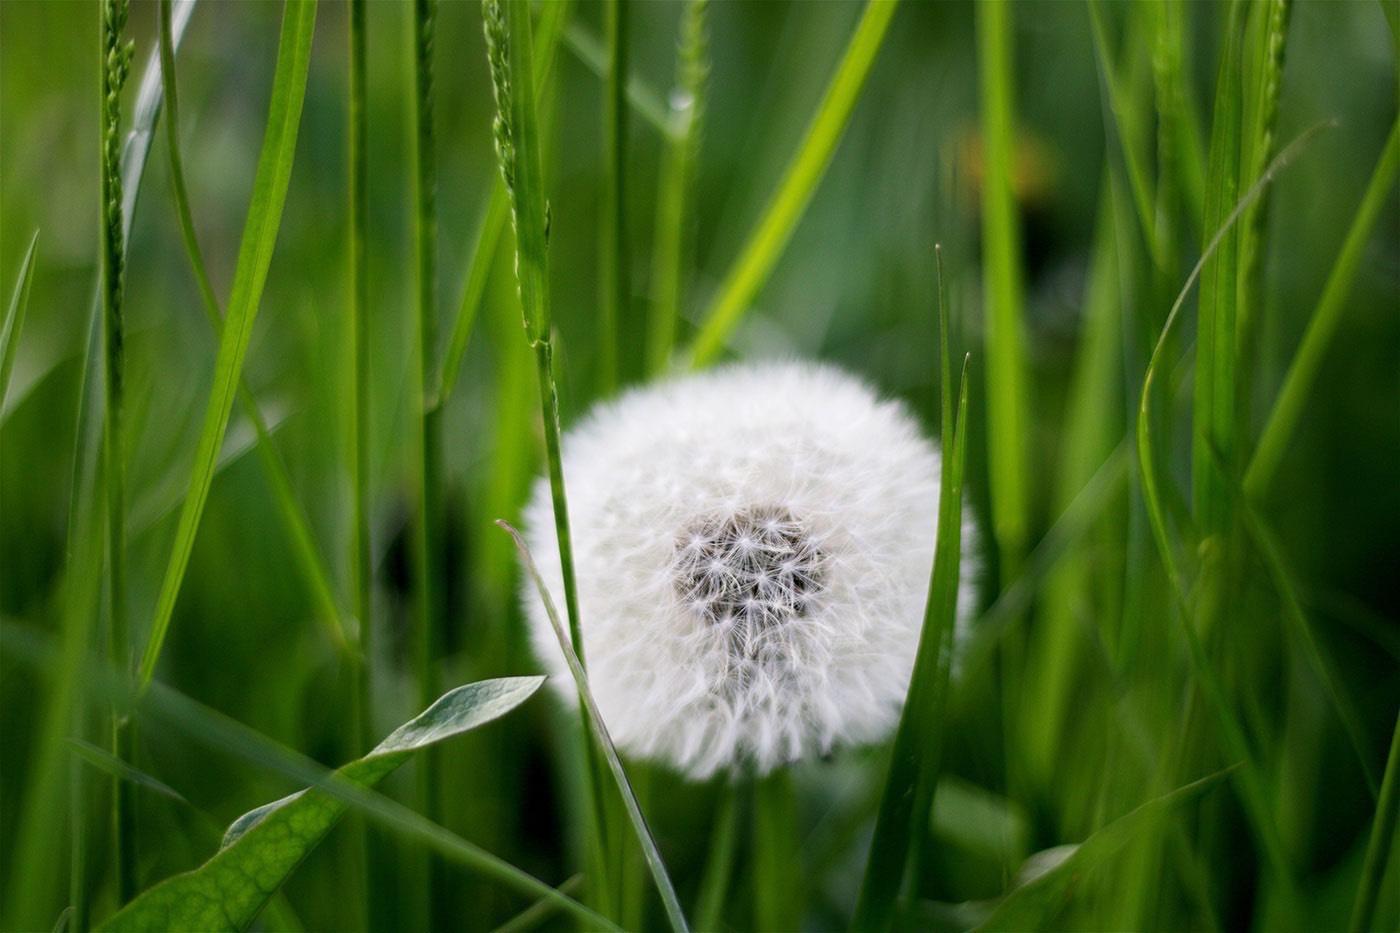 Dandelion weed control information